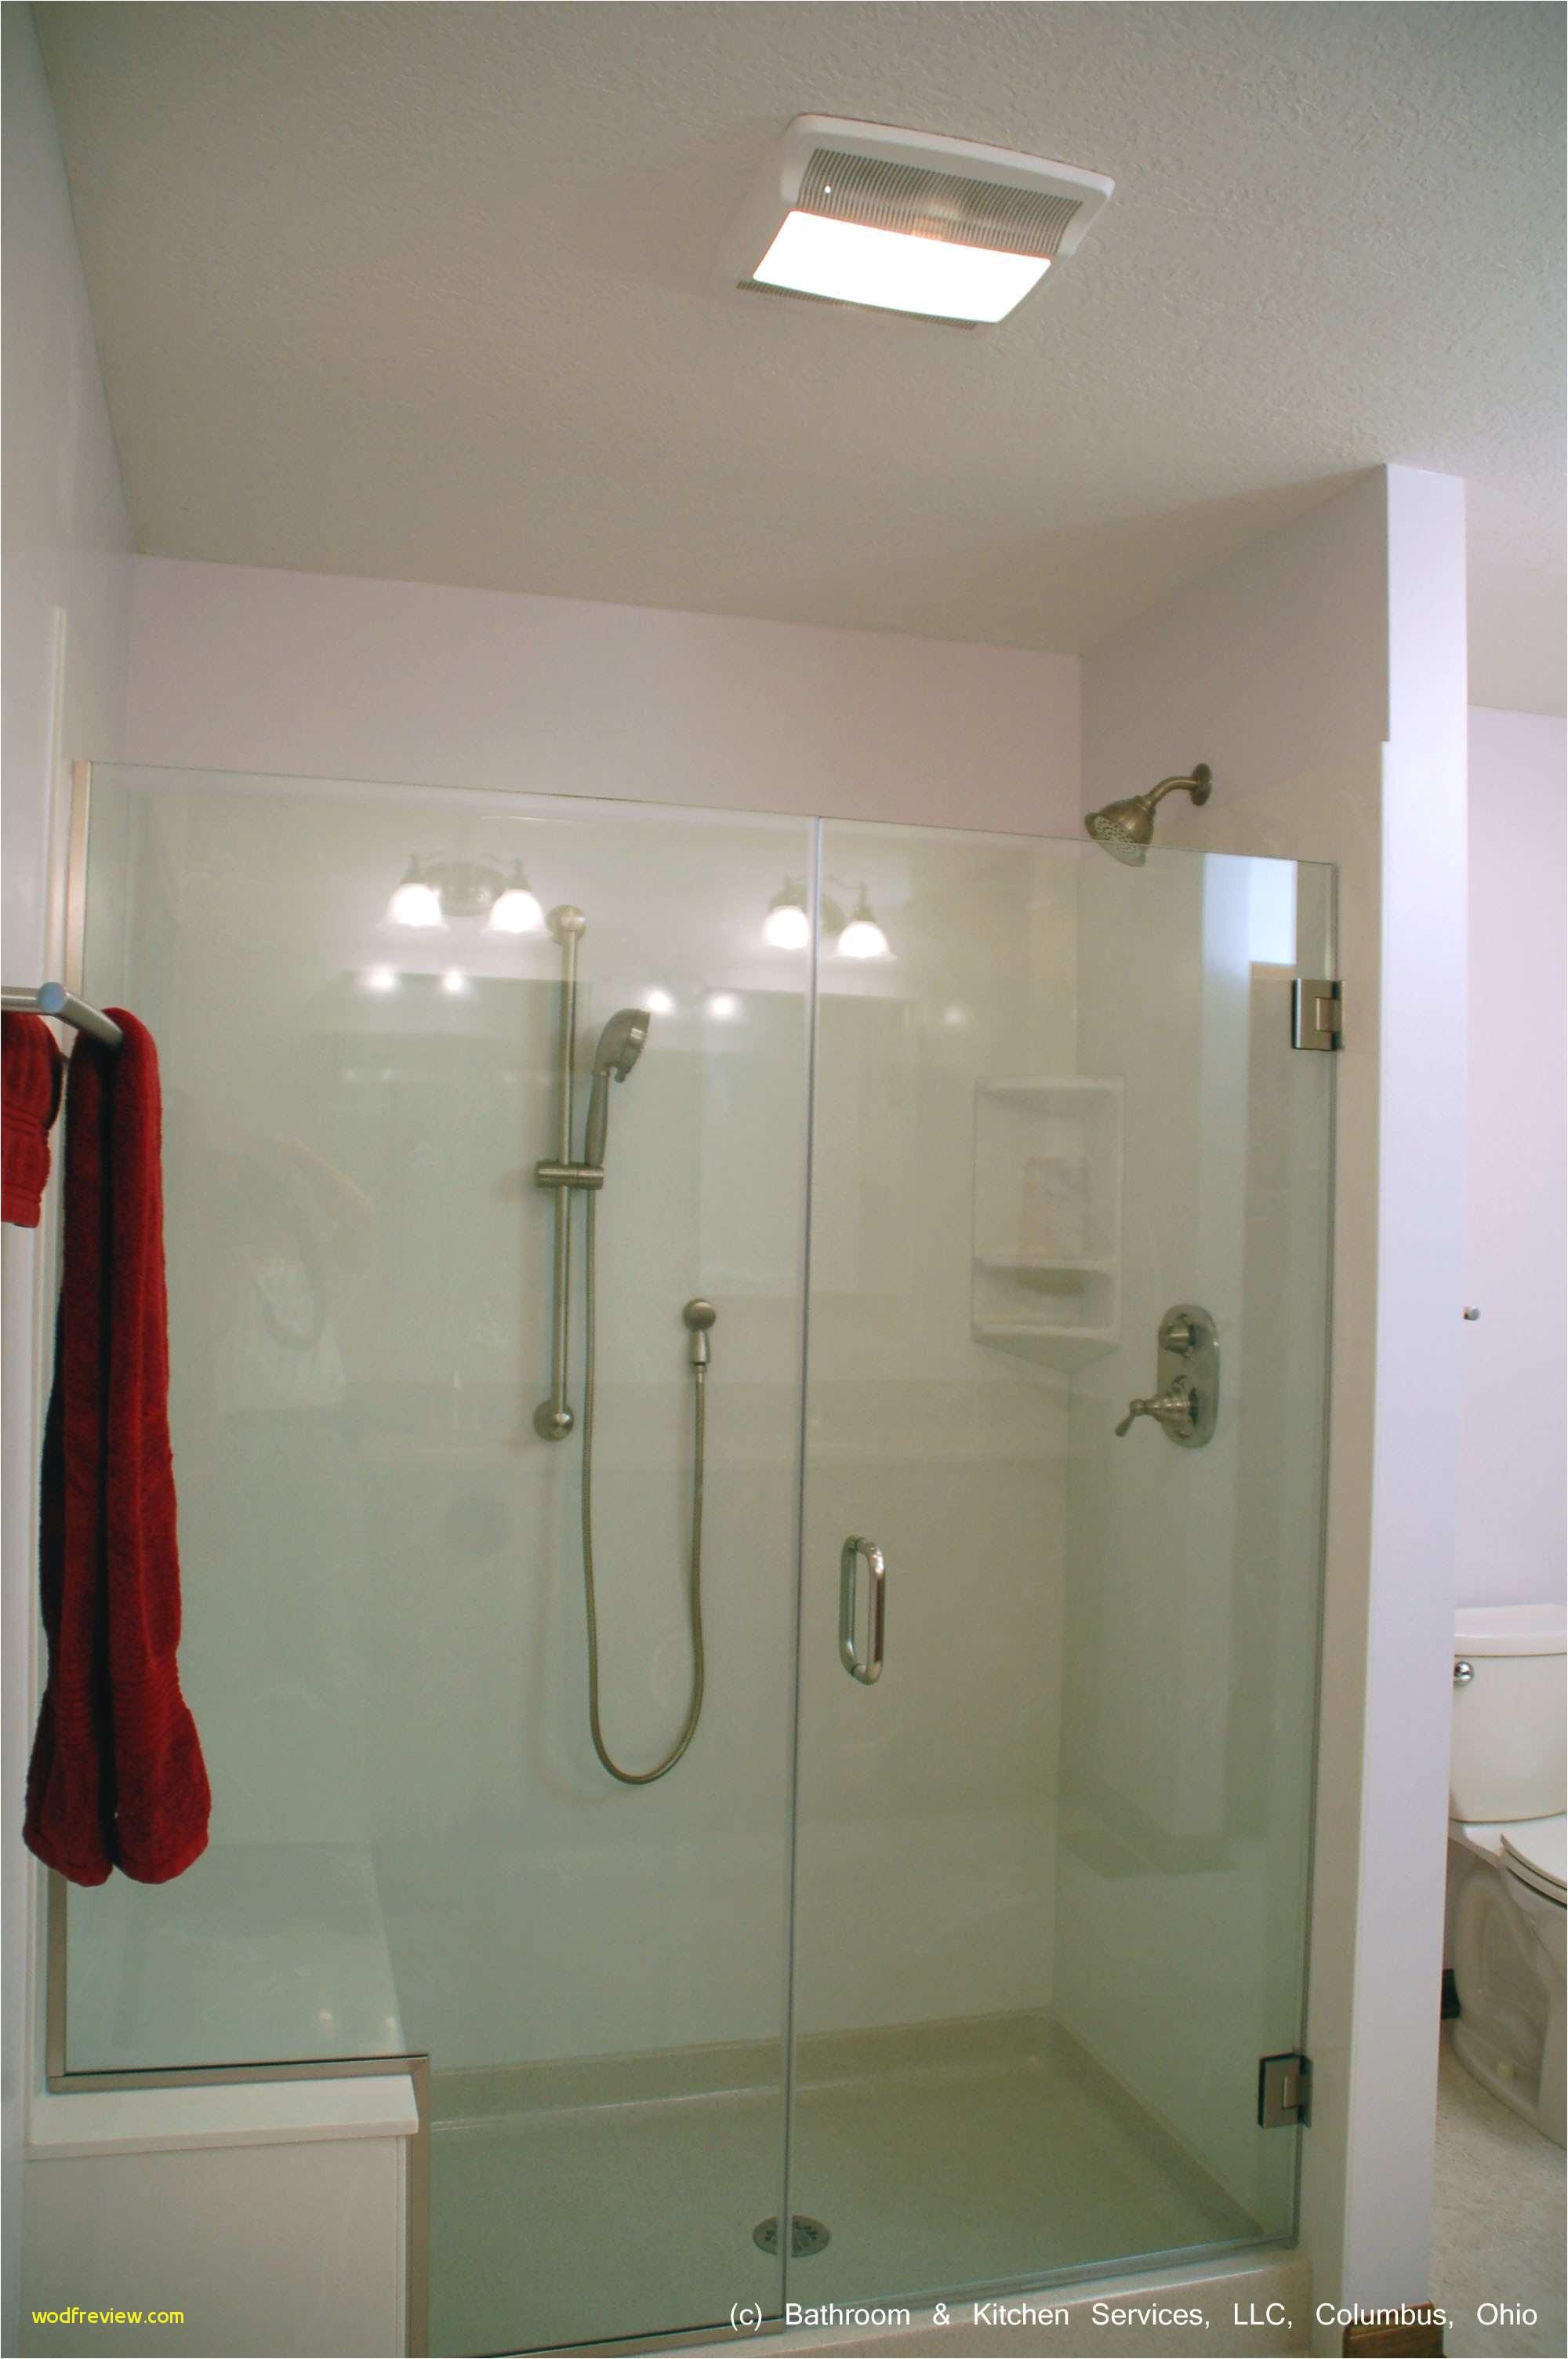 diy bathtub lovely bathroom design marble elegant shower light new h sink install i 0d